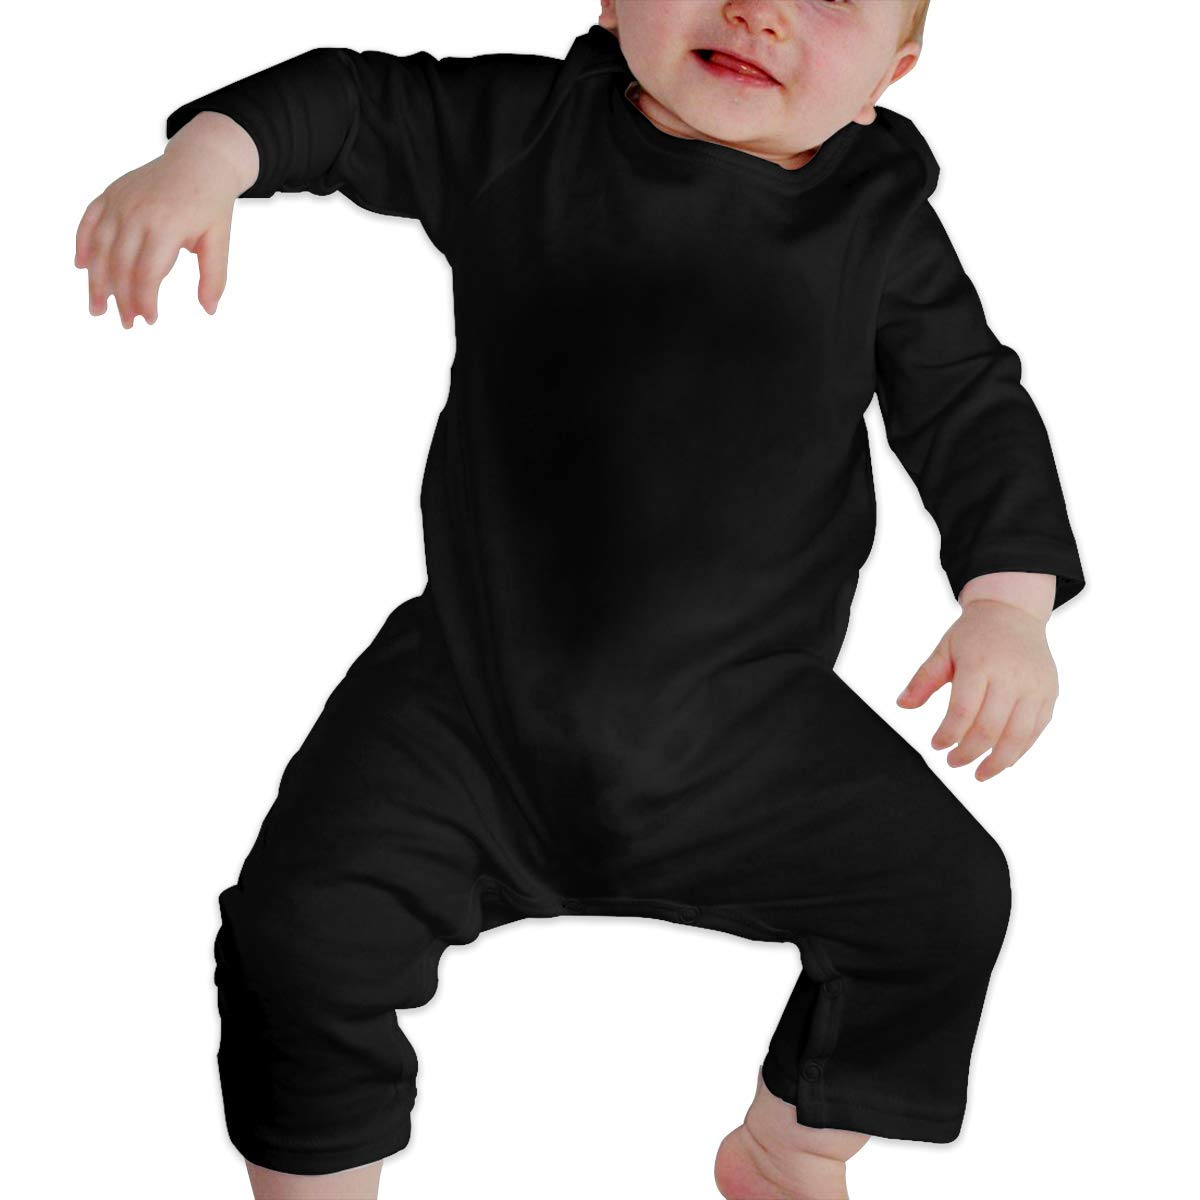 UGFGF-S3 British Flag Baby Boy Girl Long Sleeve Romper Jumpsuit Bodysuits Onsies